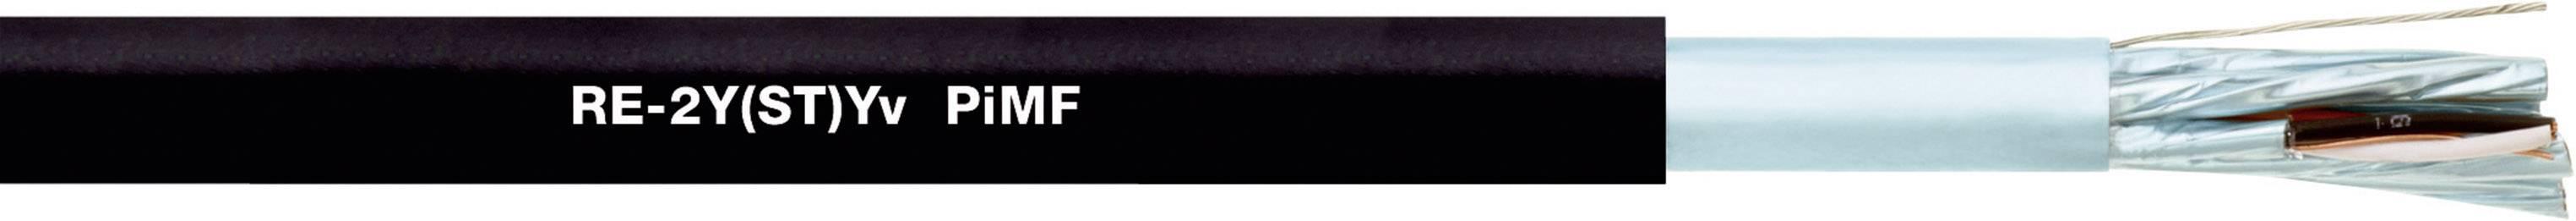 Datový kabel RE-2Y(ST)Yv PiMF 16 x 2 x 0.50 mm² černá LAPP 0032453 100 m